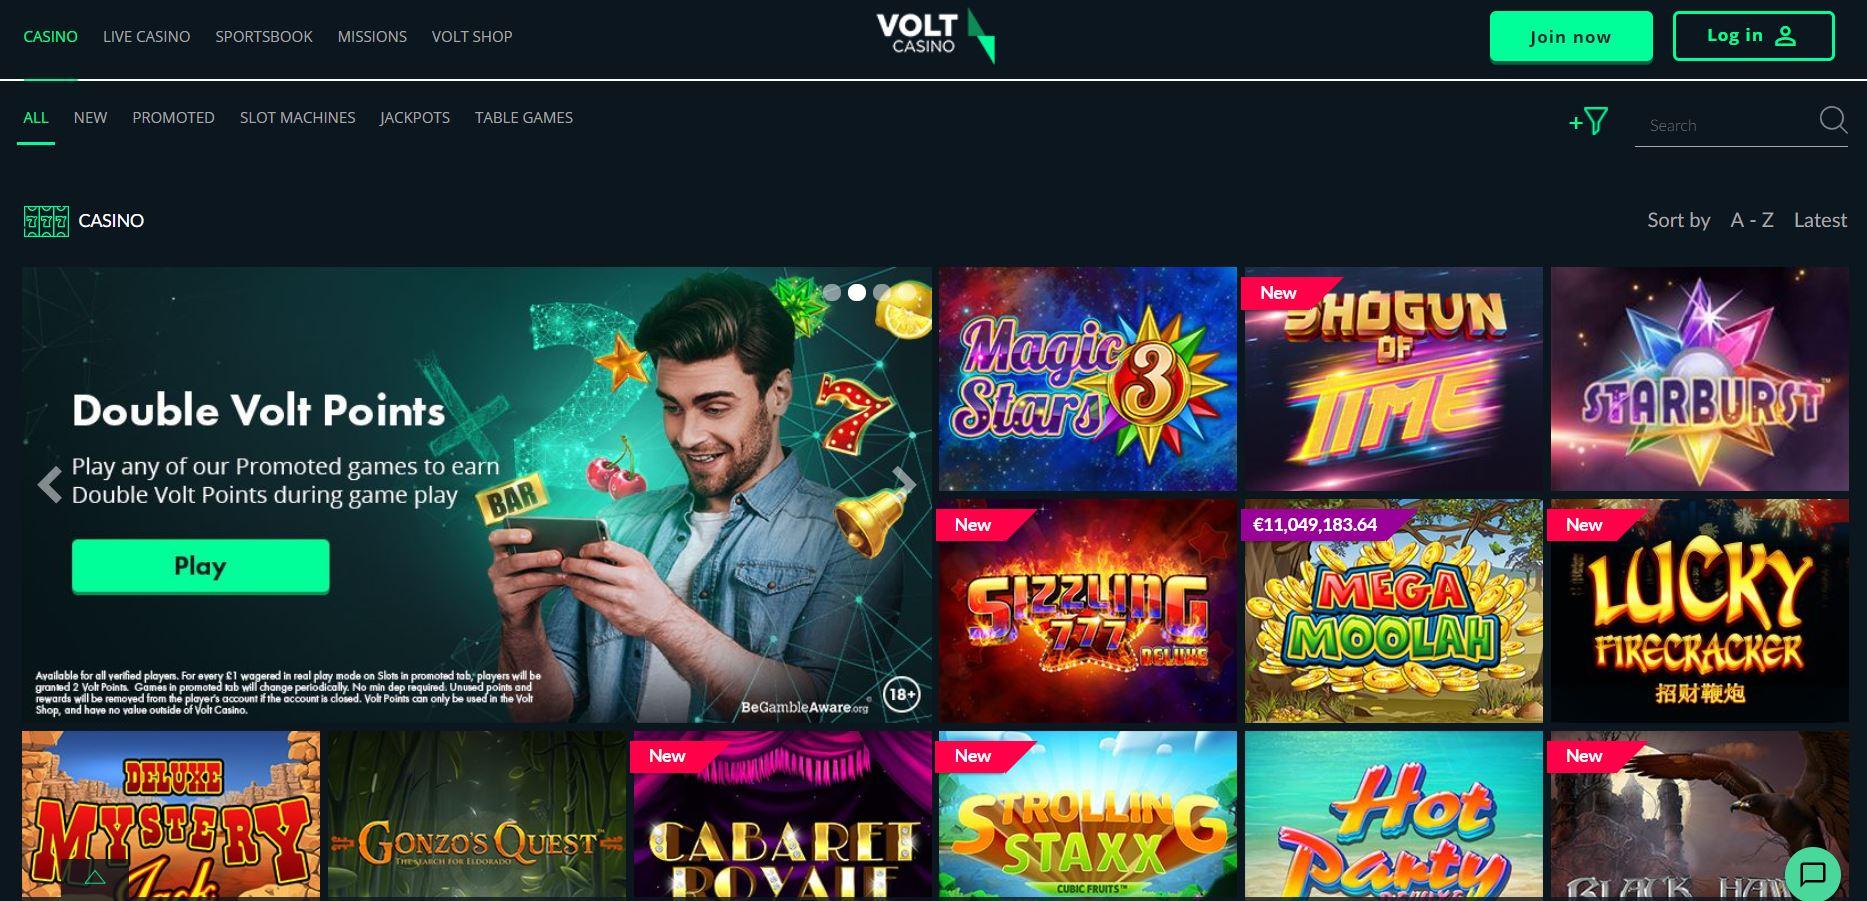 Volt Casino Homepage